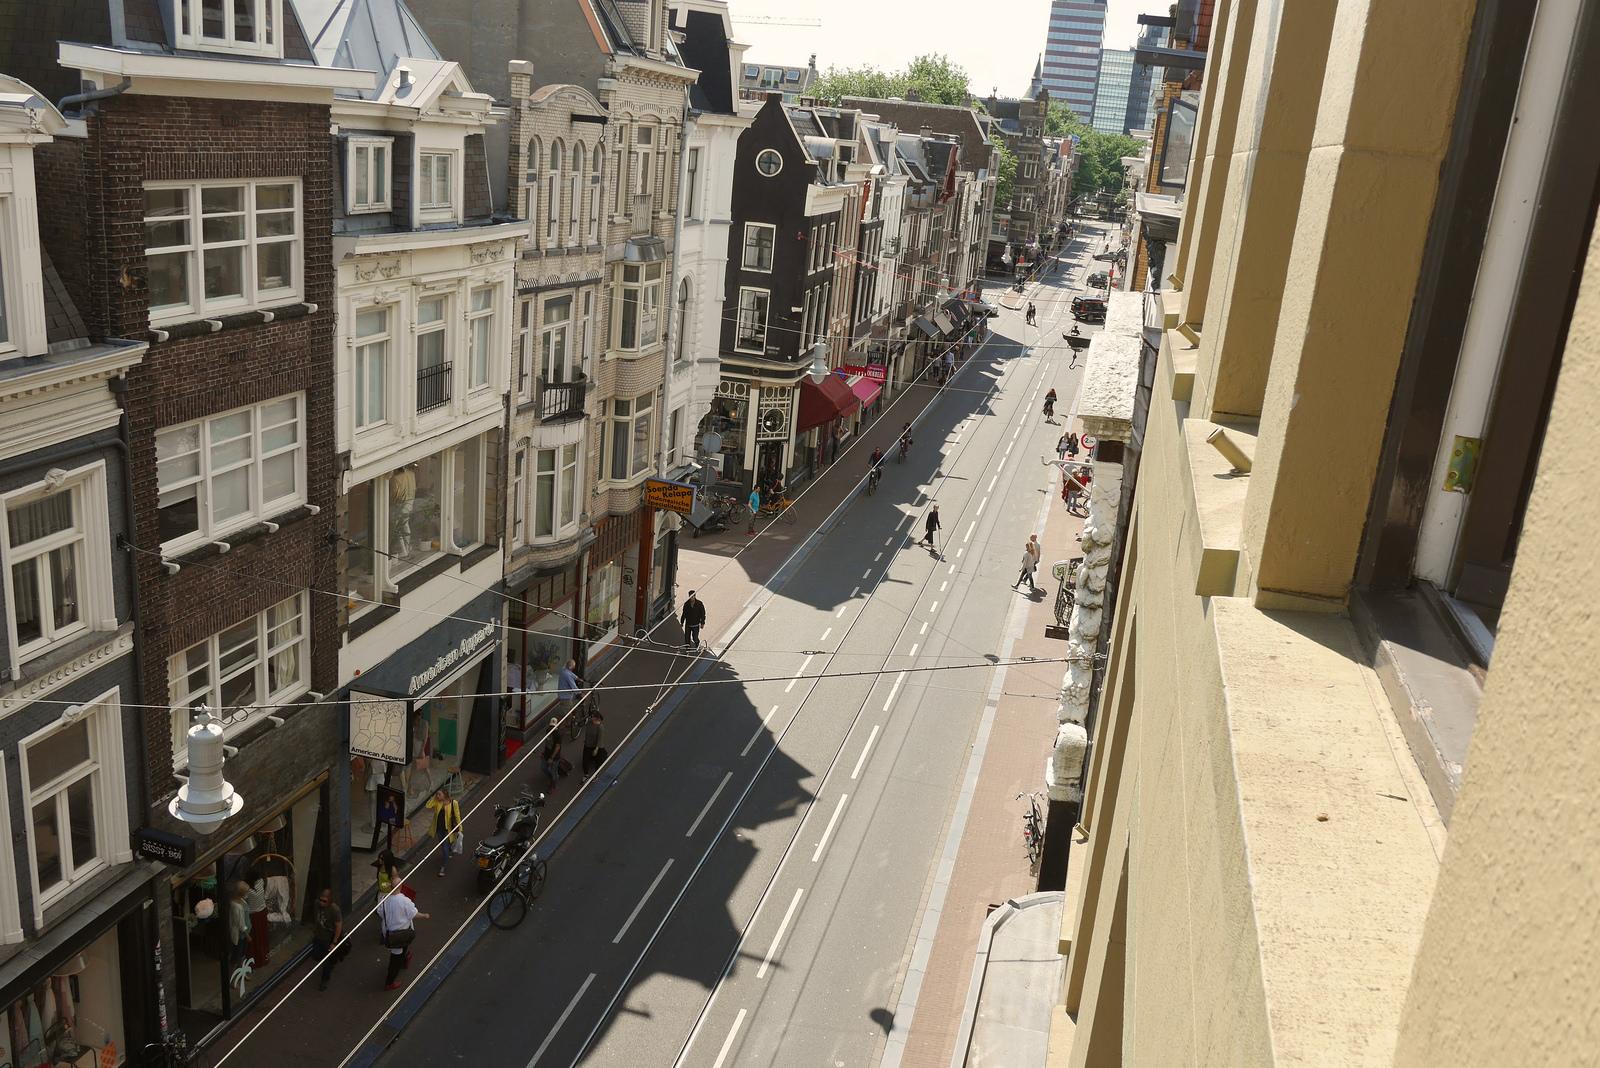 Utrechtsestraat Franklin Heijnen Flickr